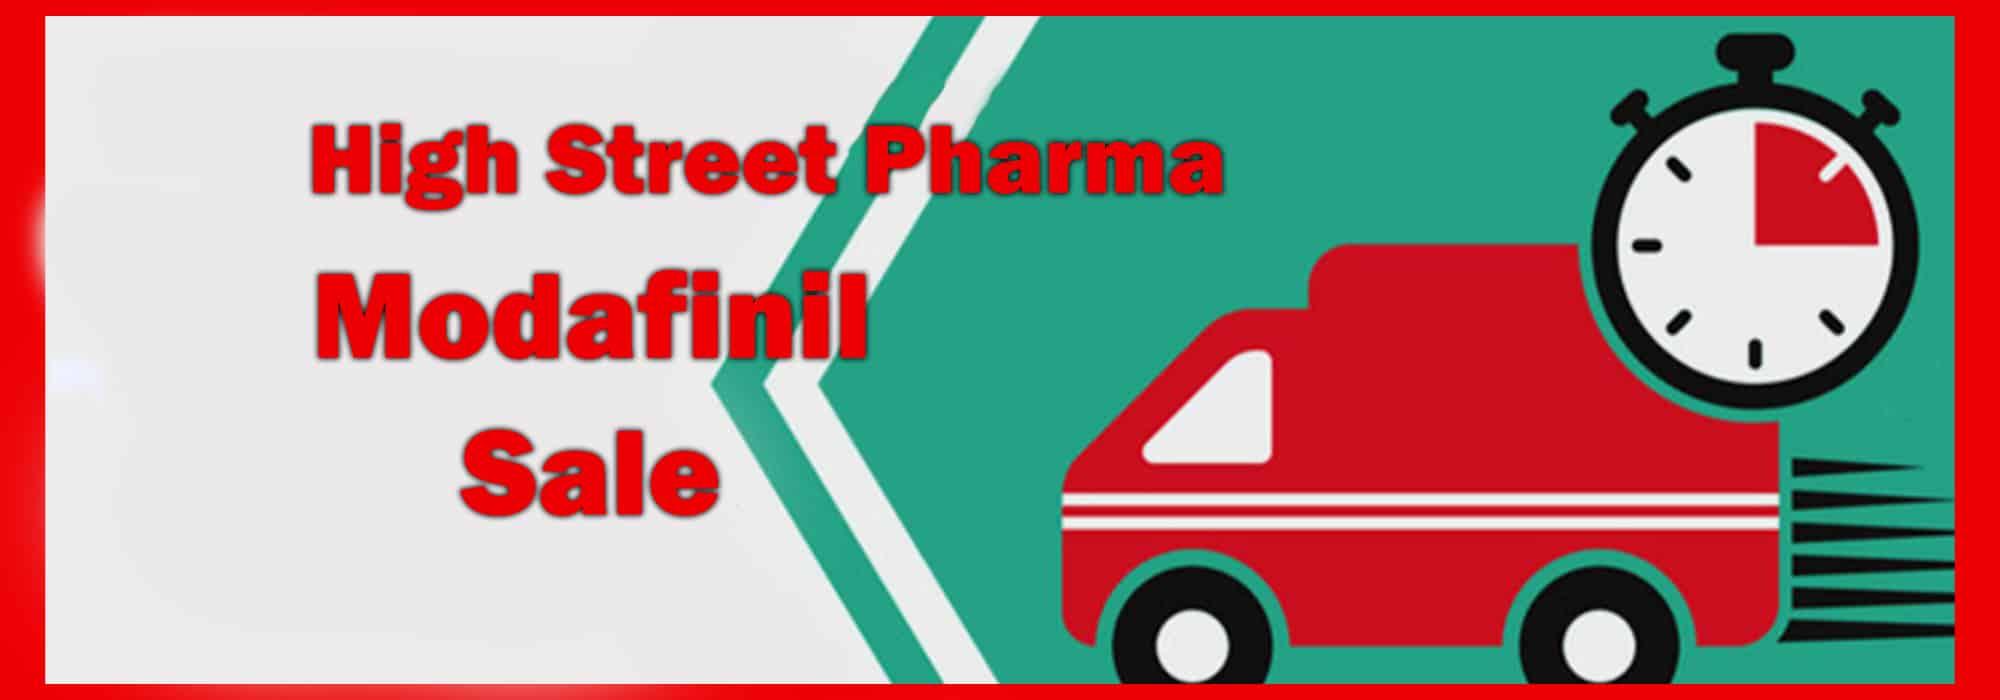 High Street Pharma Sale